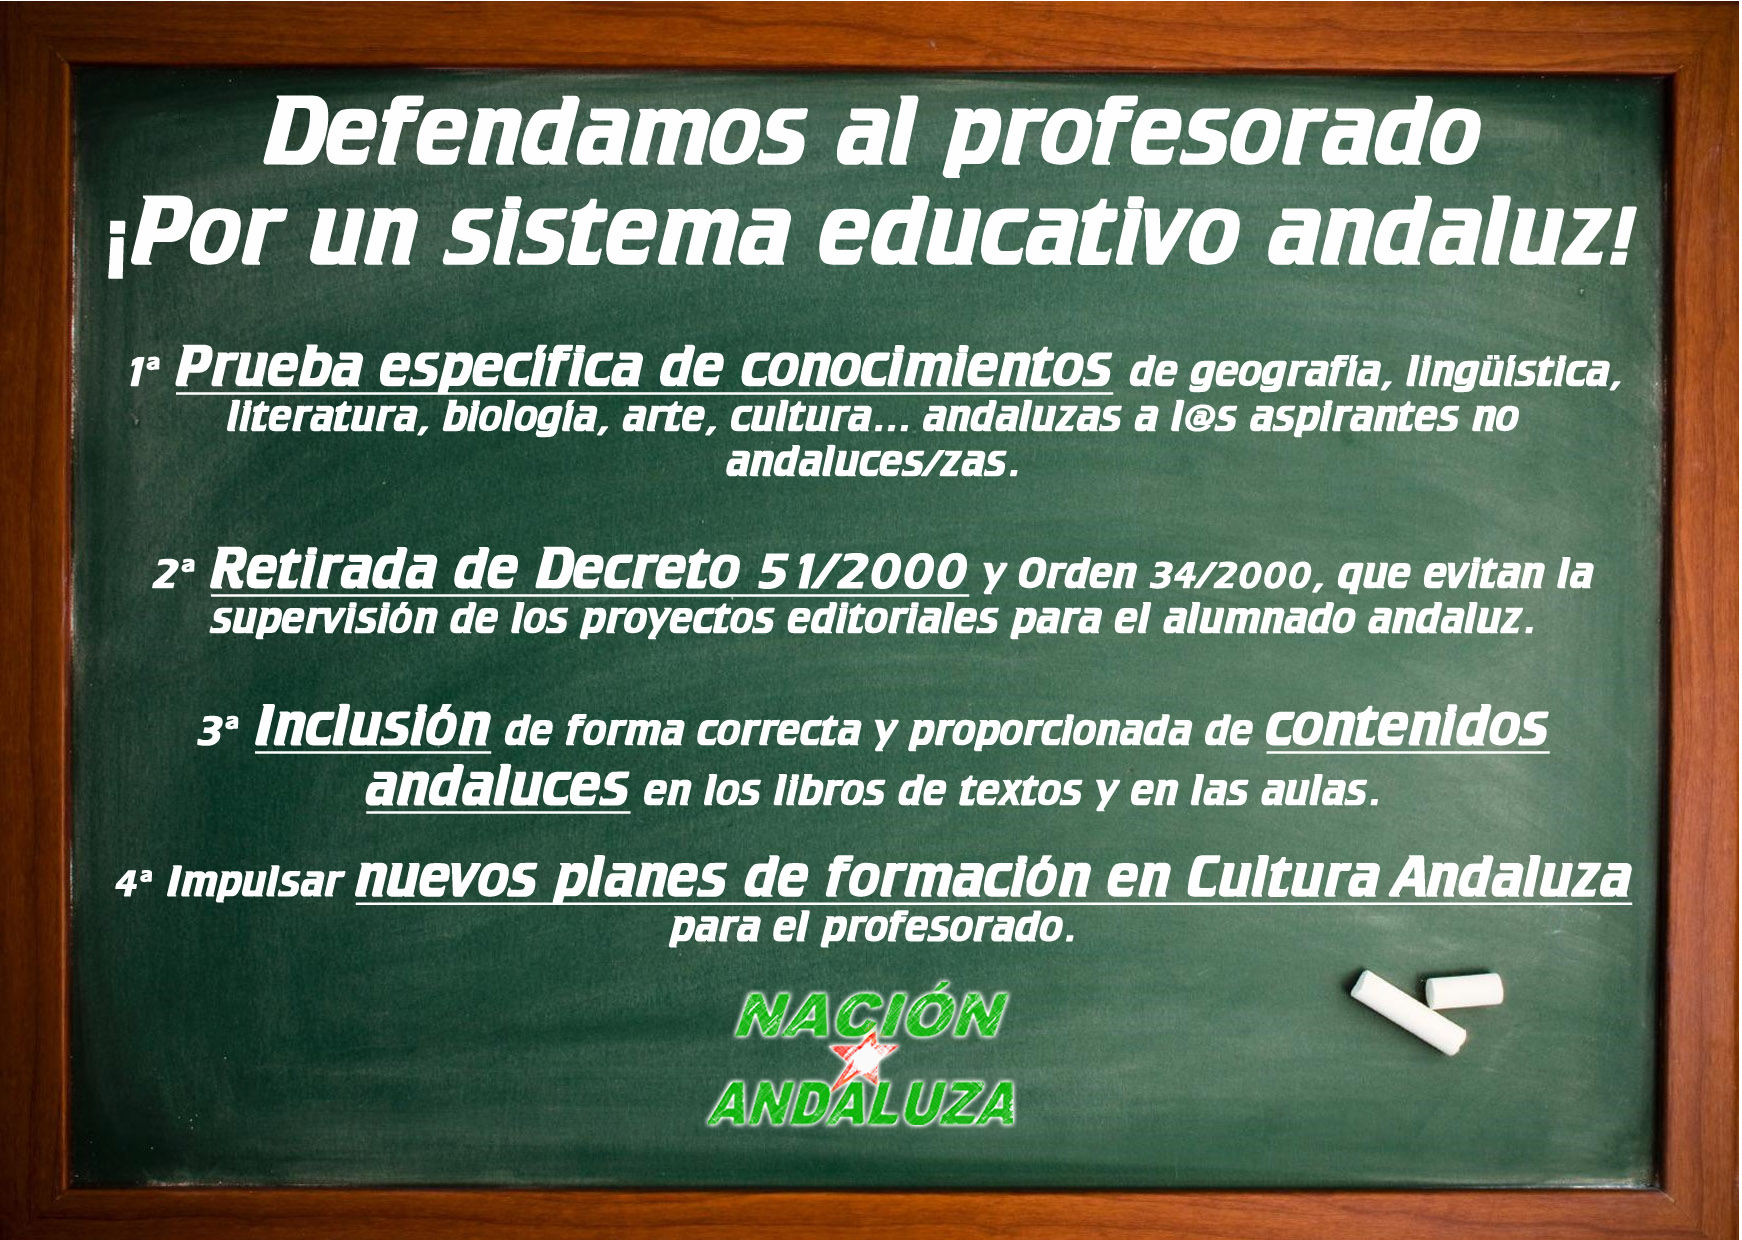 Defendamos al profesorado andaluz ¡Por un sistema educativo andaluz!